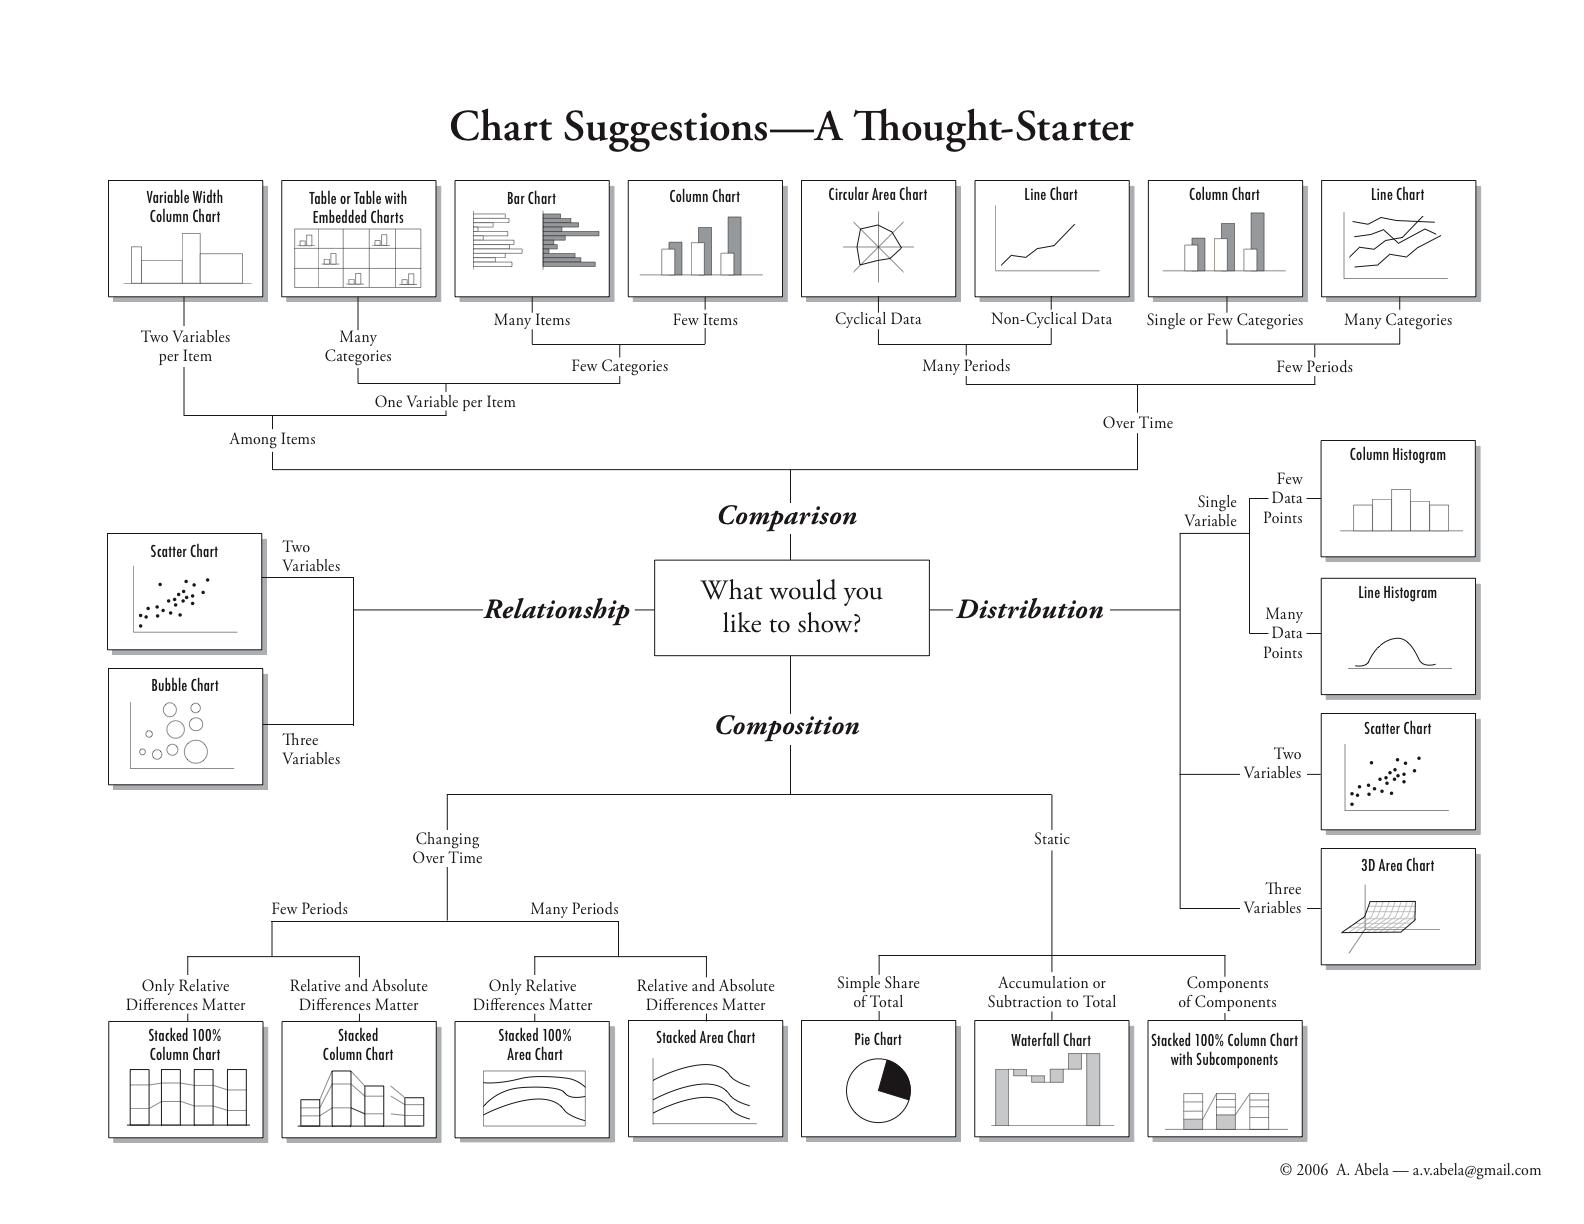 Choosing a good chart